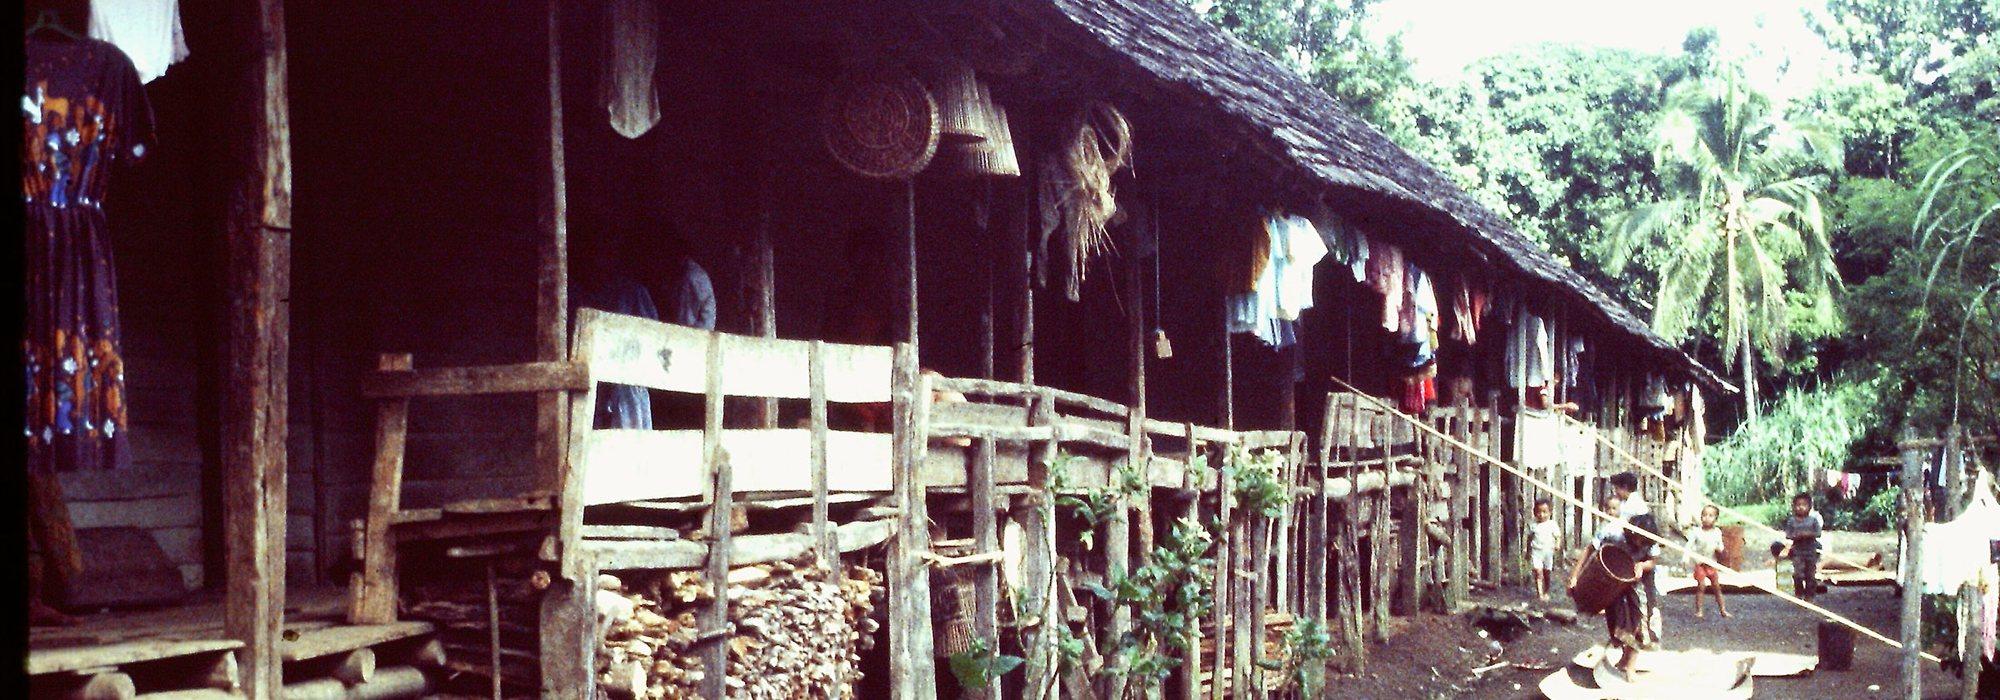 A longhouse